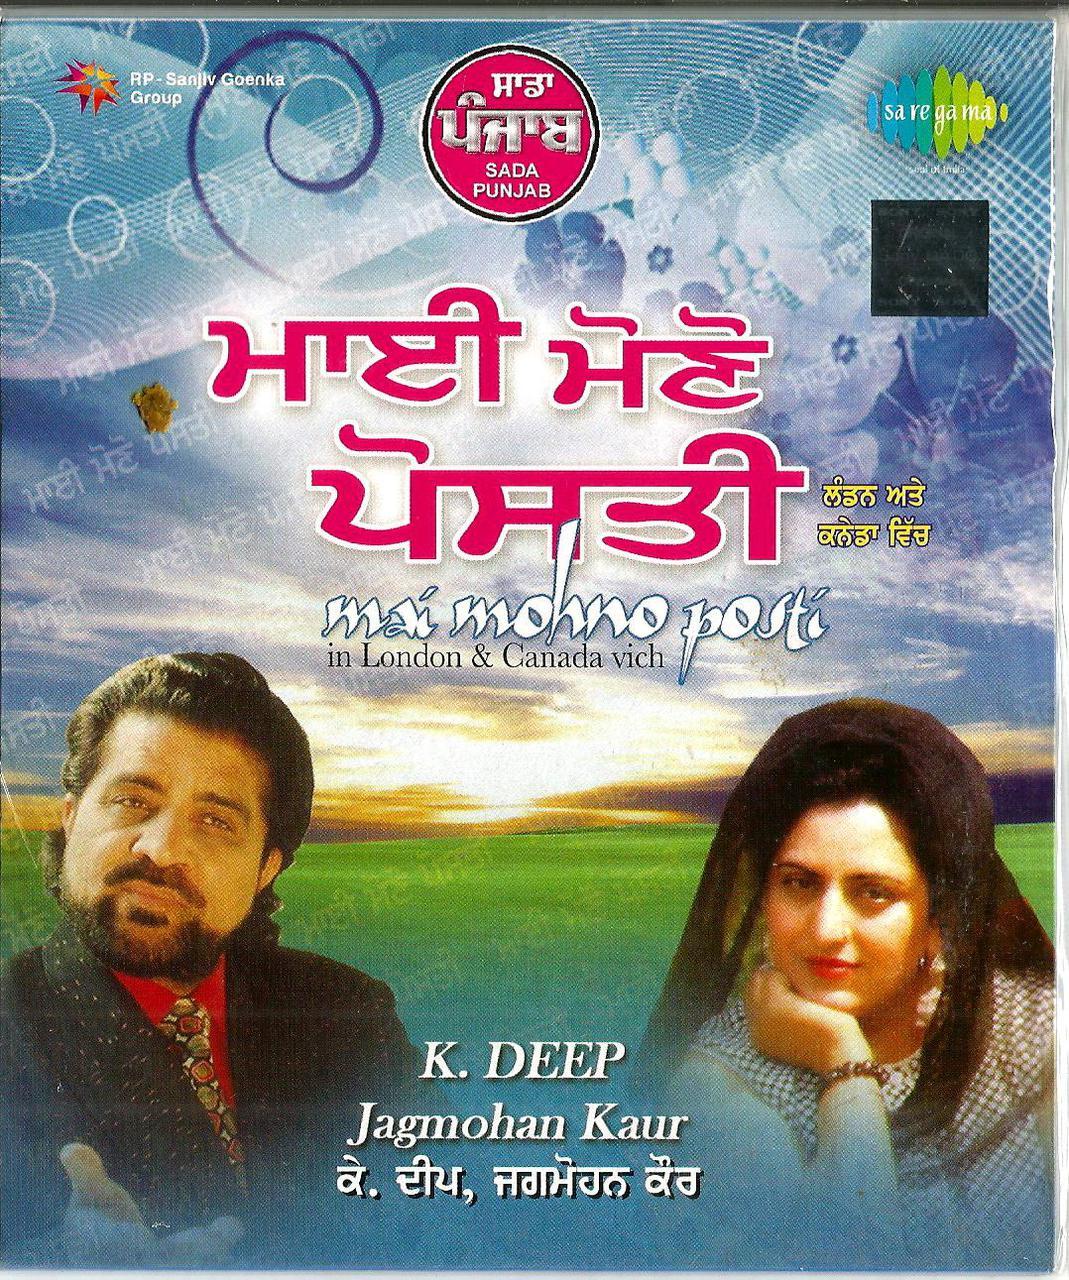 Mai Mohno Posti London / K.Deep & Jagmohan Kaur / MP3 - India Town Gifts